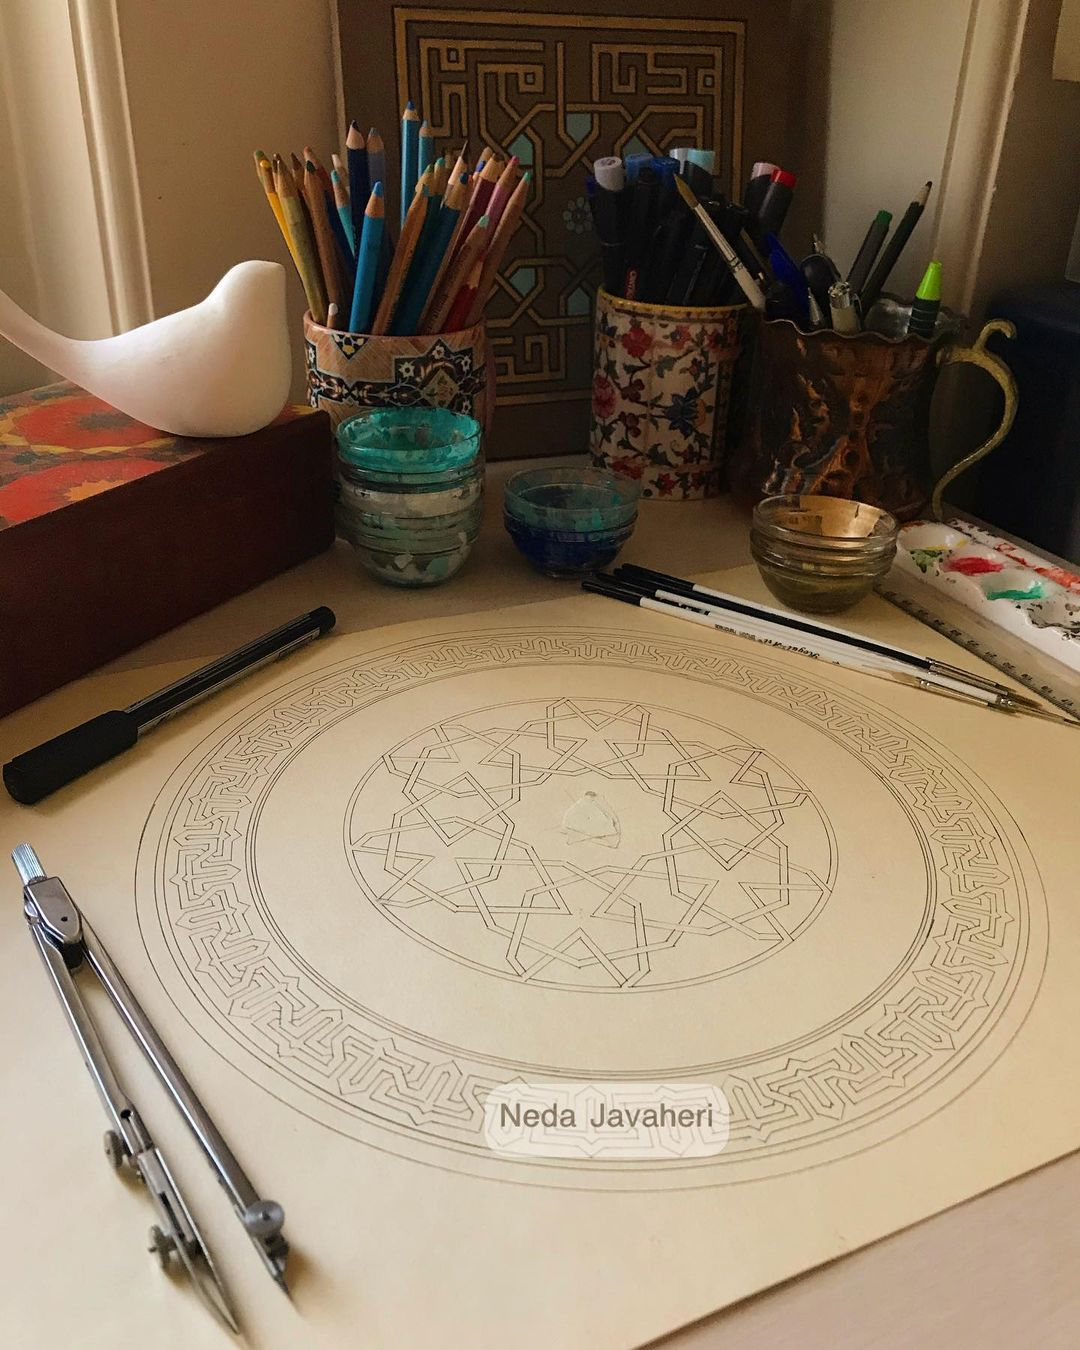 Karya Kaligrafi  گر من ز می مُغانه مستم، هستم، گر کافِر و گَبْر و بتپرستم، هستم، هر طایفهای به…- Ne Javaher